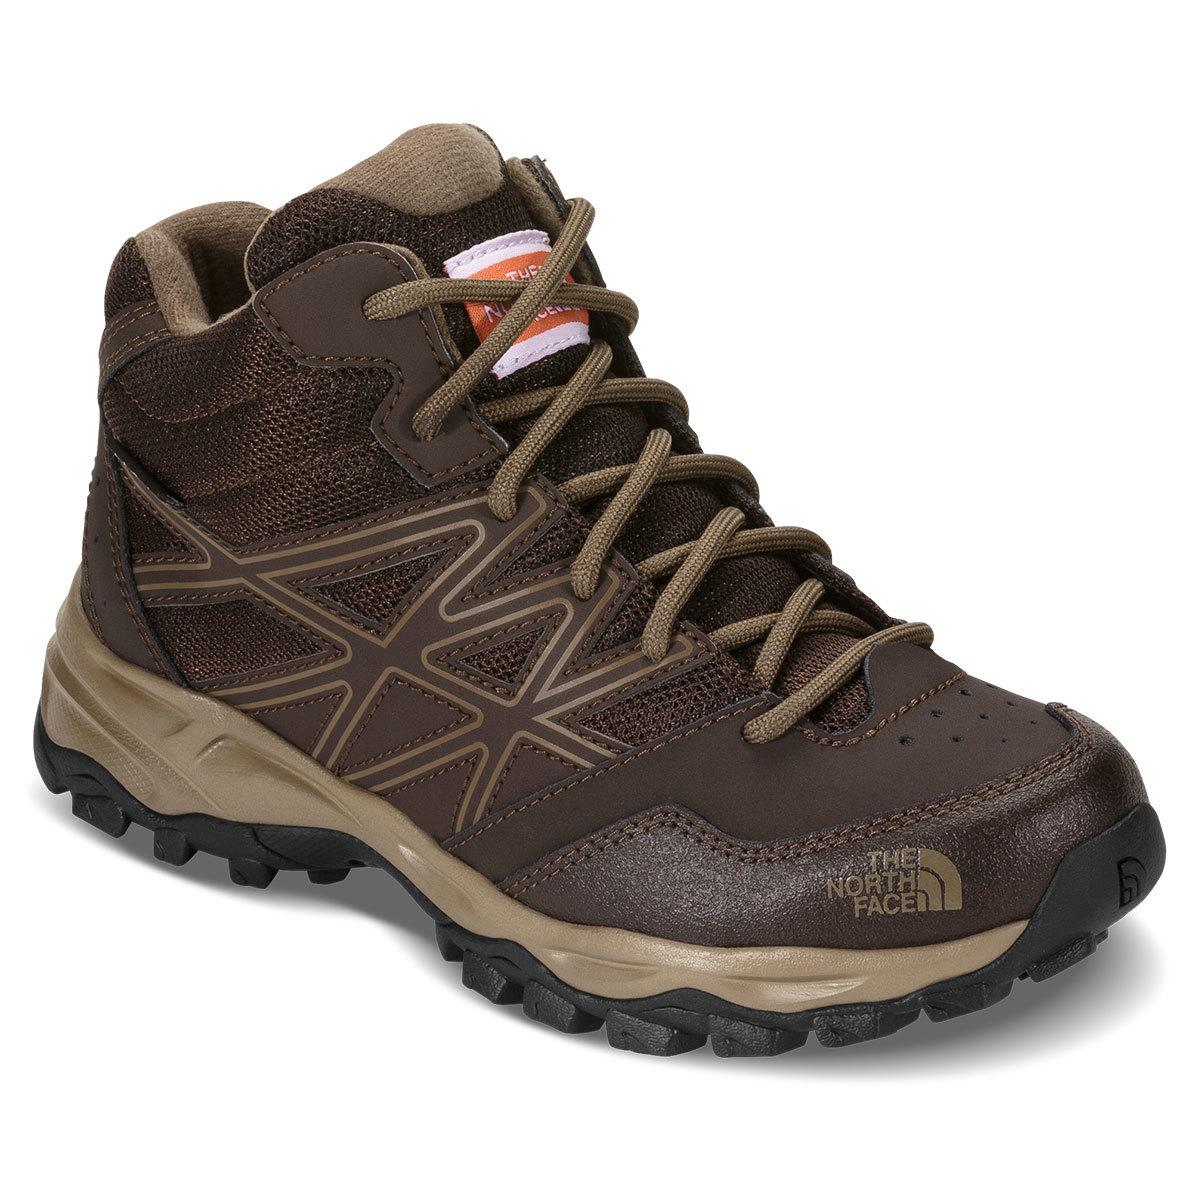 The North Face Boys' Jr Hedgehog Hiker Mid Waterproof Hiking Boots - Brown, 4.5